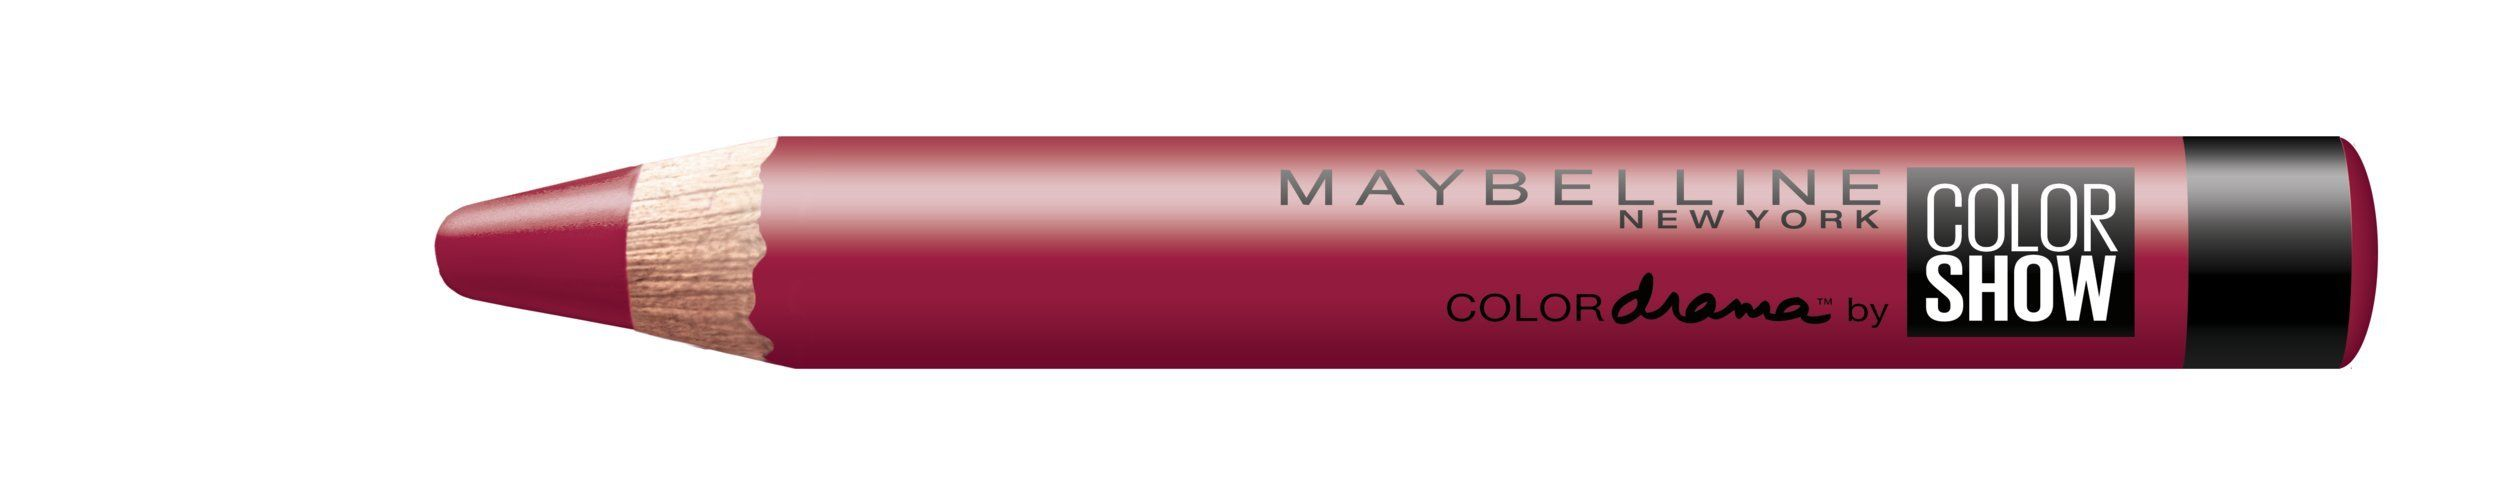 Maybelline New York Color Drama Intense Velvet Lip Pencil Number 520 Light It Up Maybelline New York Color Drama Int Colors Drama Maybelline Maybelline Color